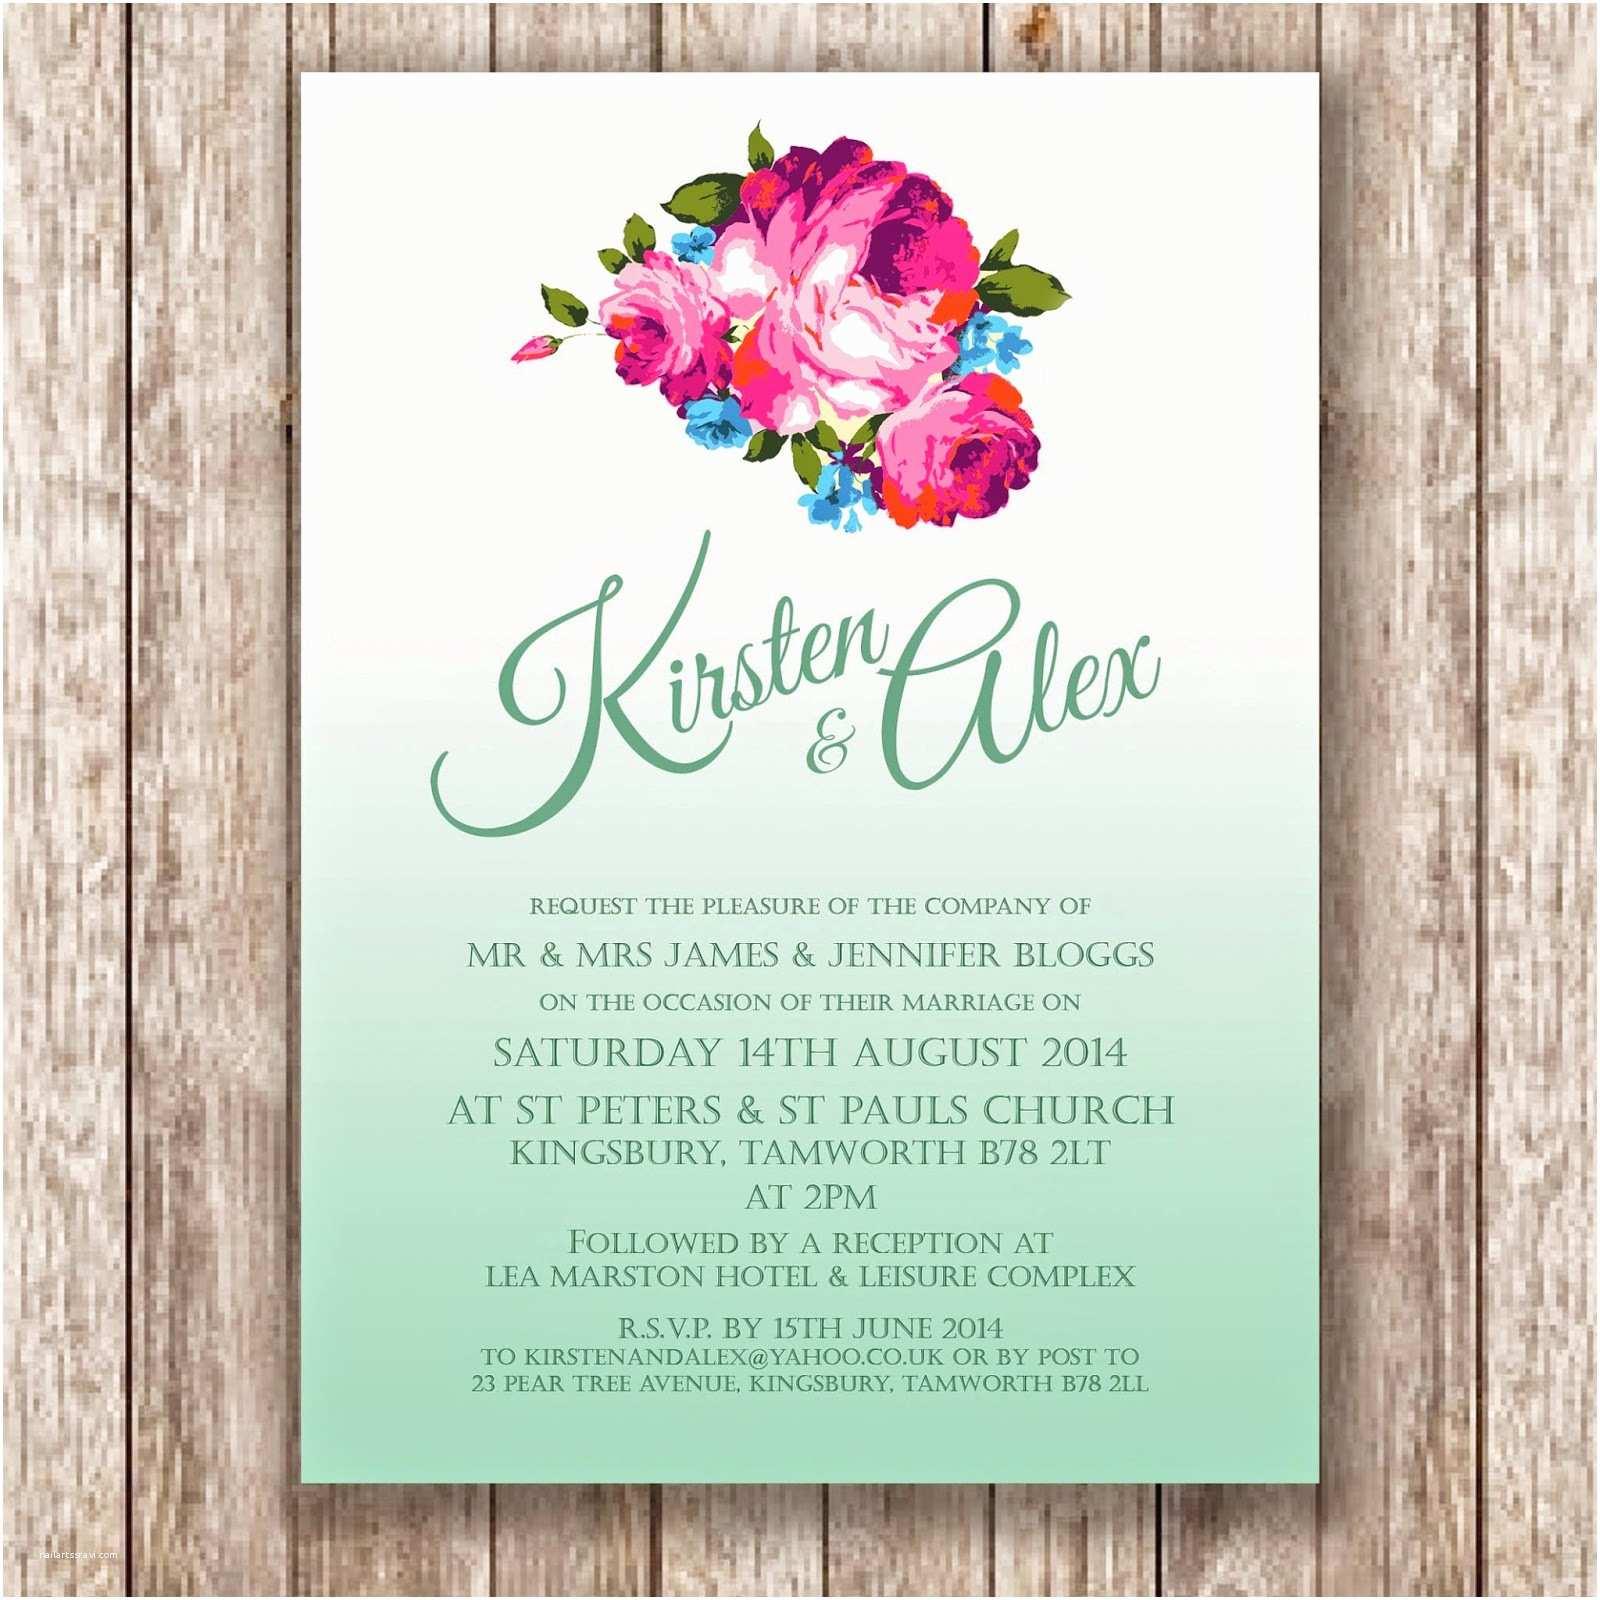 Wedding Invitation Card Ideas Create Own Digital Wedding Invitations Ideas